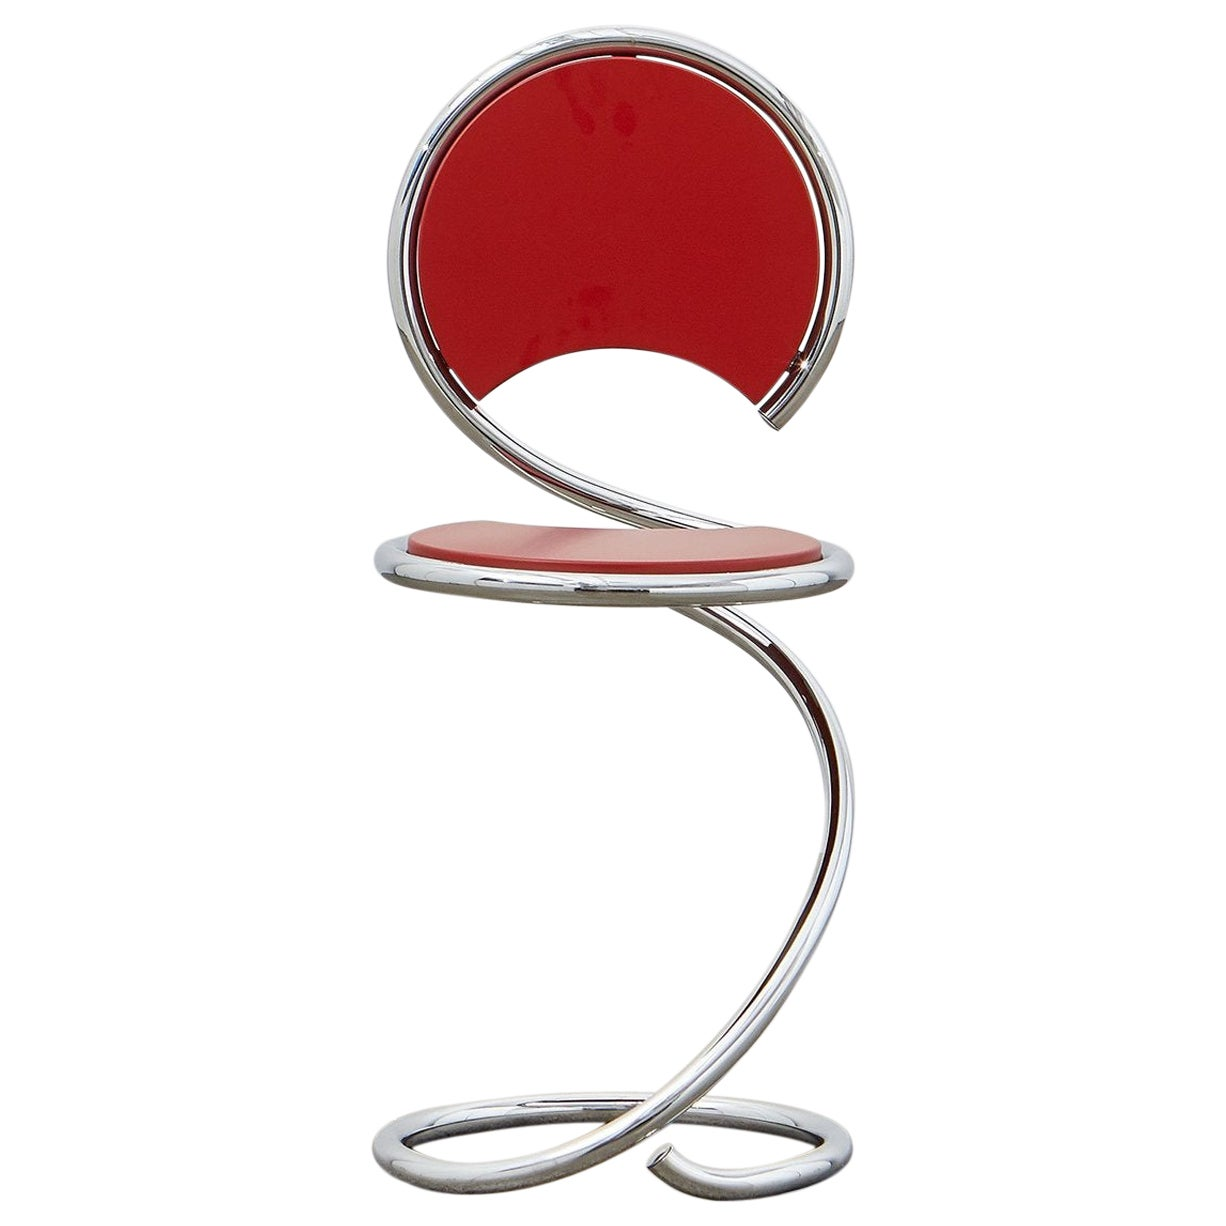 PH Snake Stool, Chrome, Red Painted Satin Matt, Wood Seat, Visible Tubes